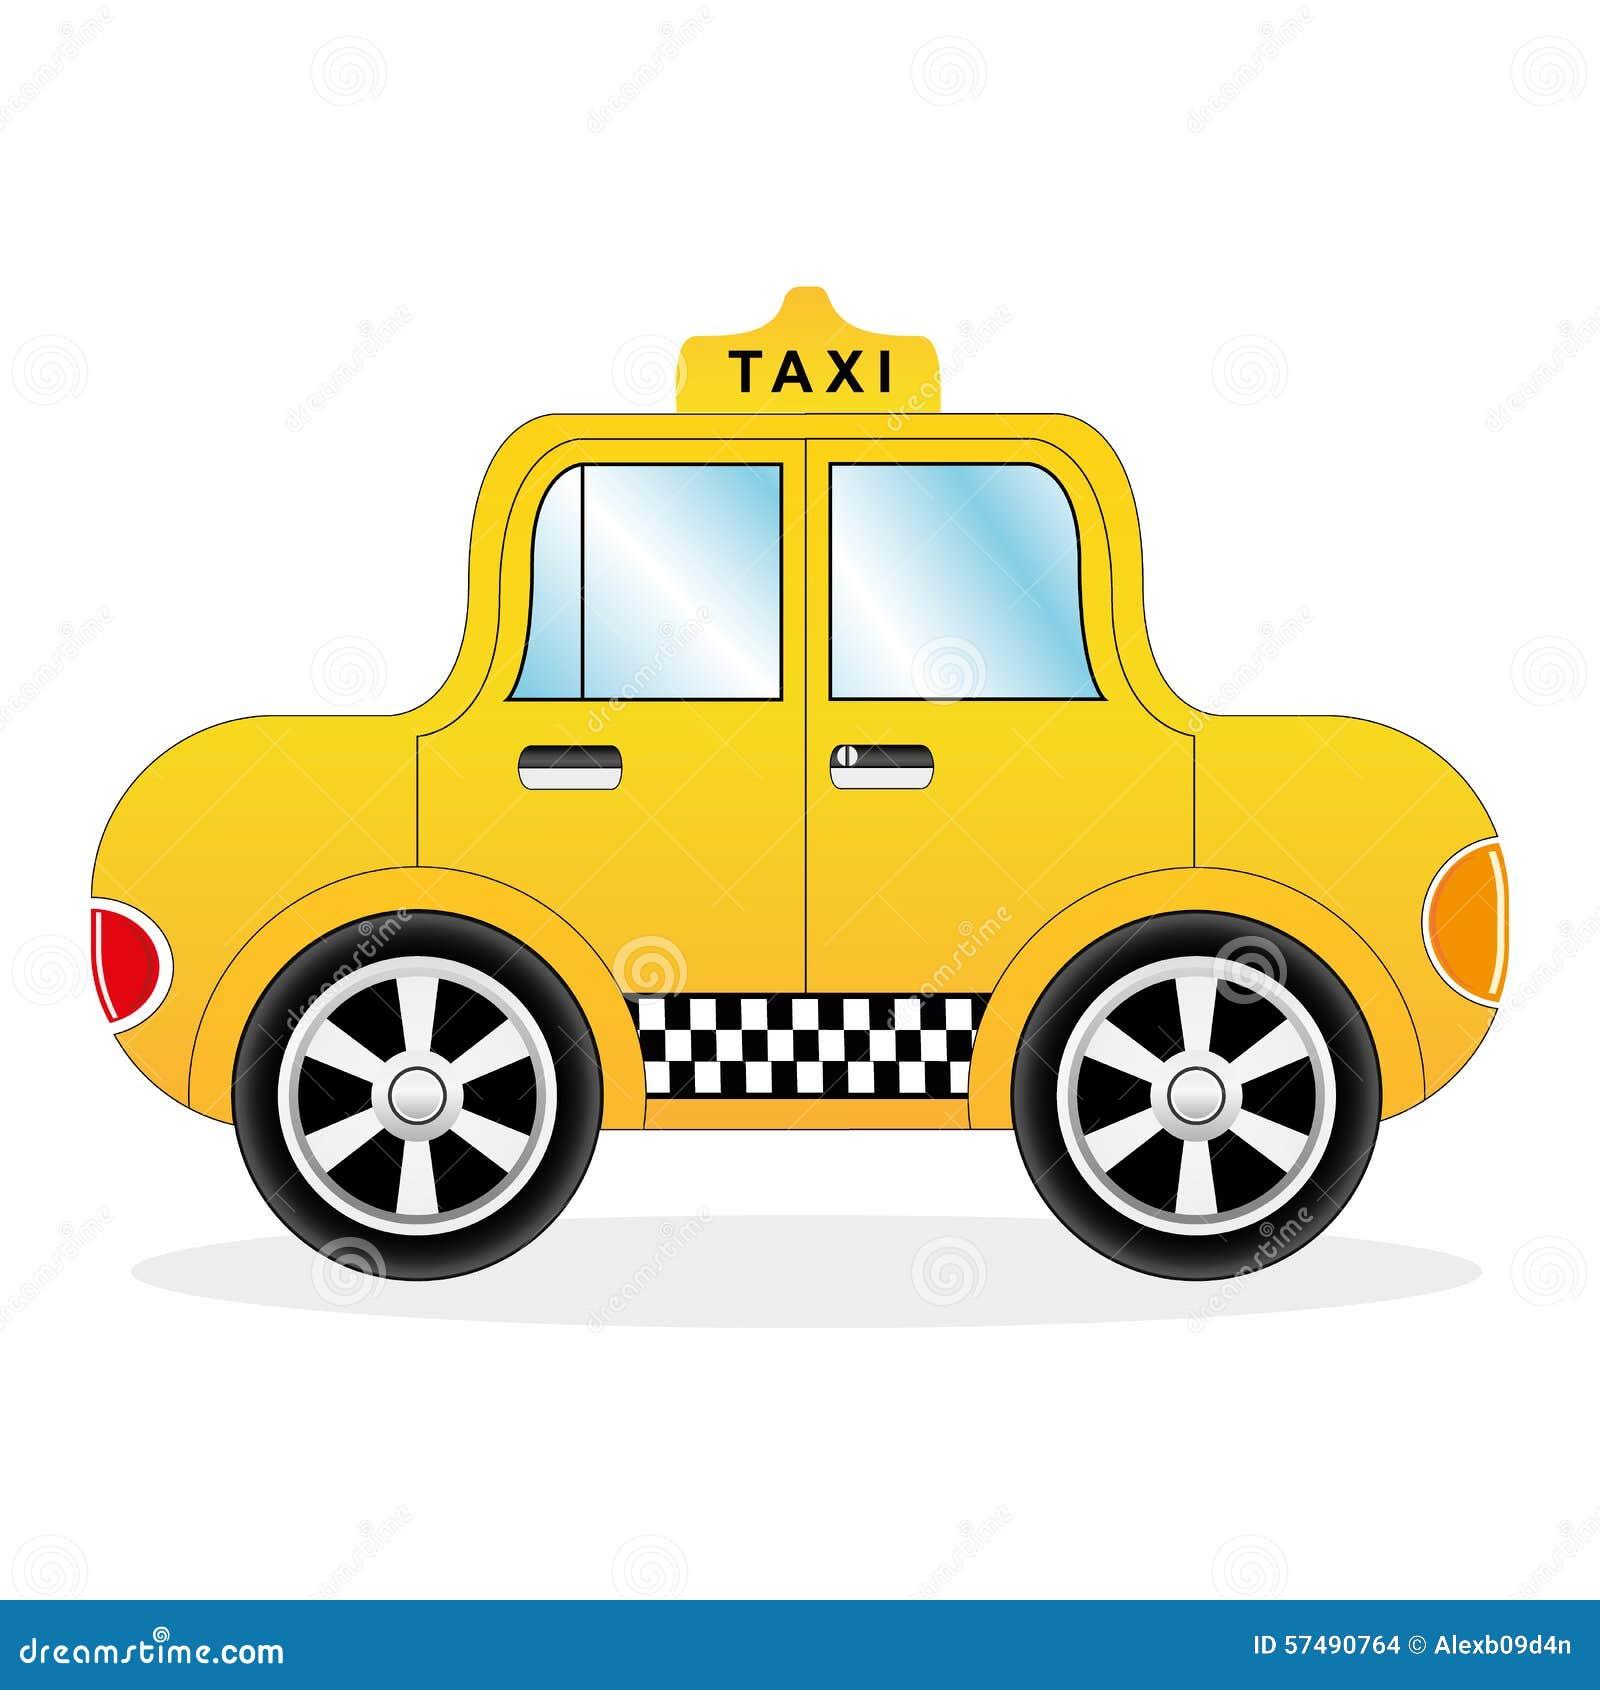 Véhicule Jaune De Taxi De Dessin Animé Illustration de Vecteur - Image: 57490764